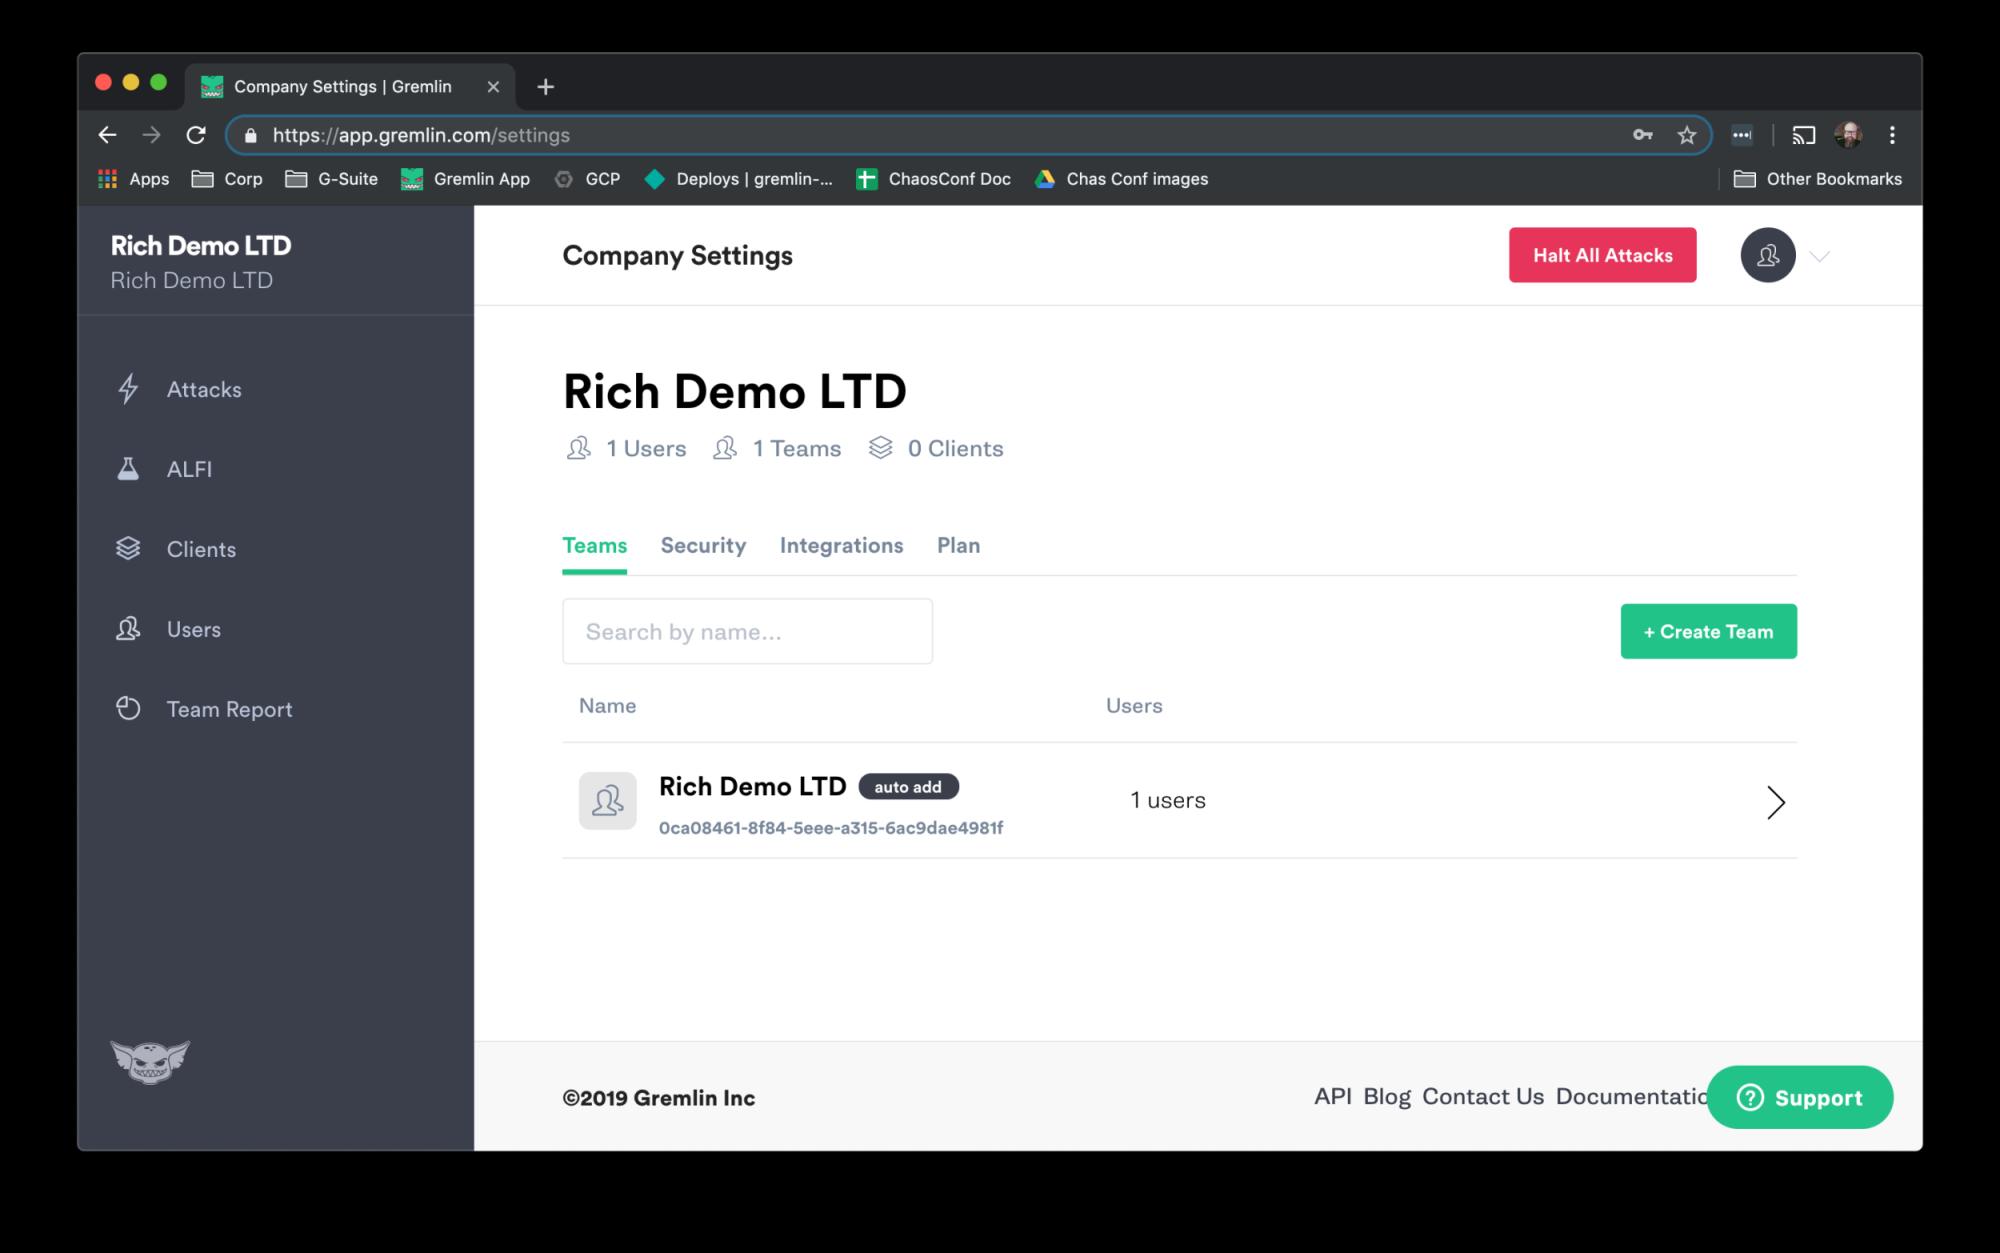 Company Settings page